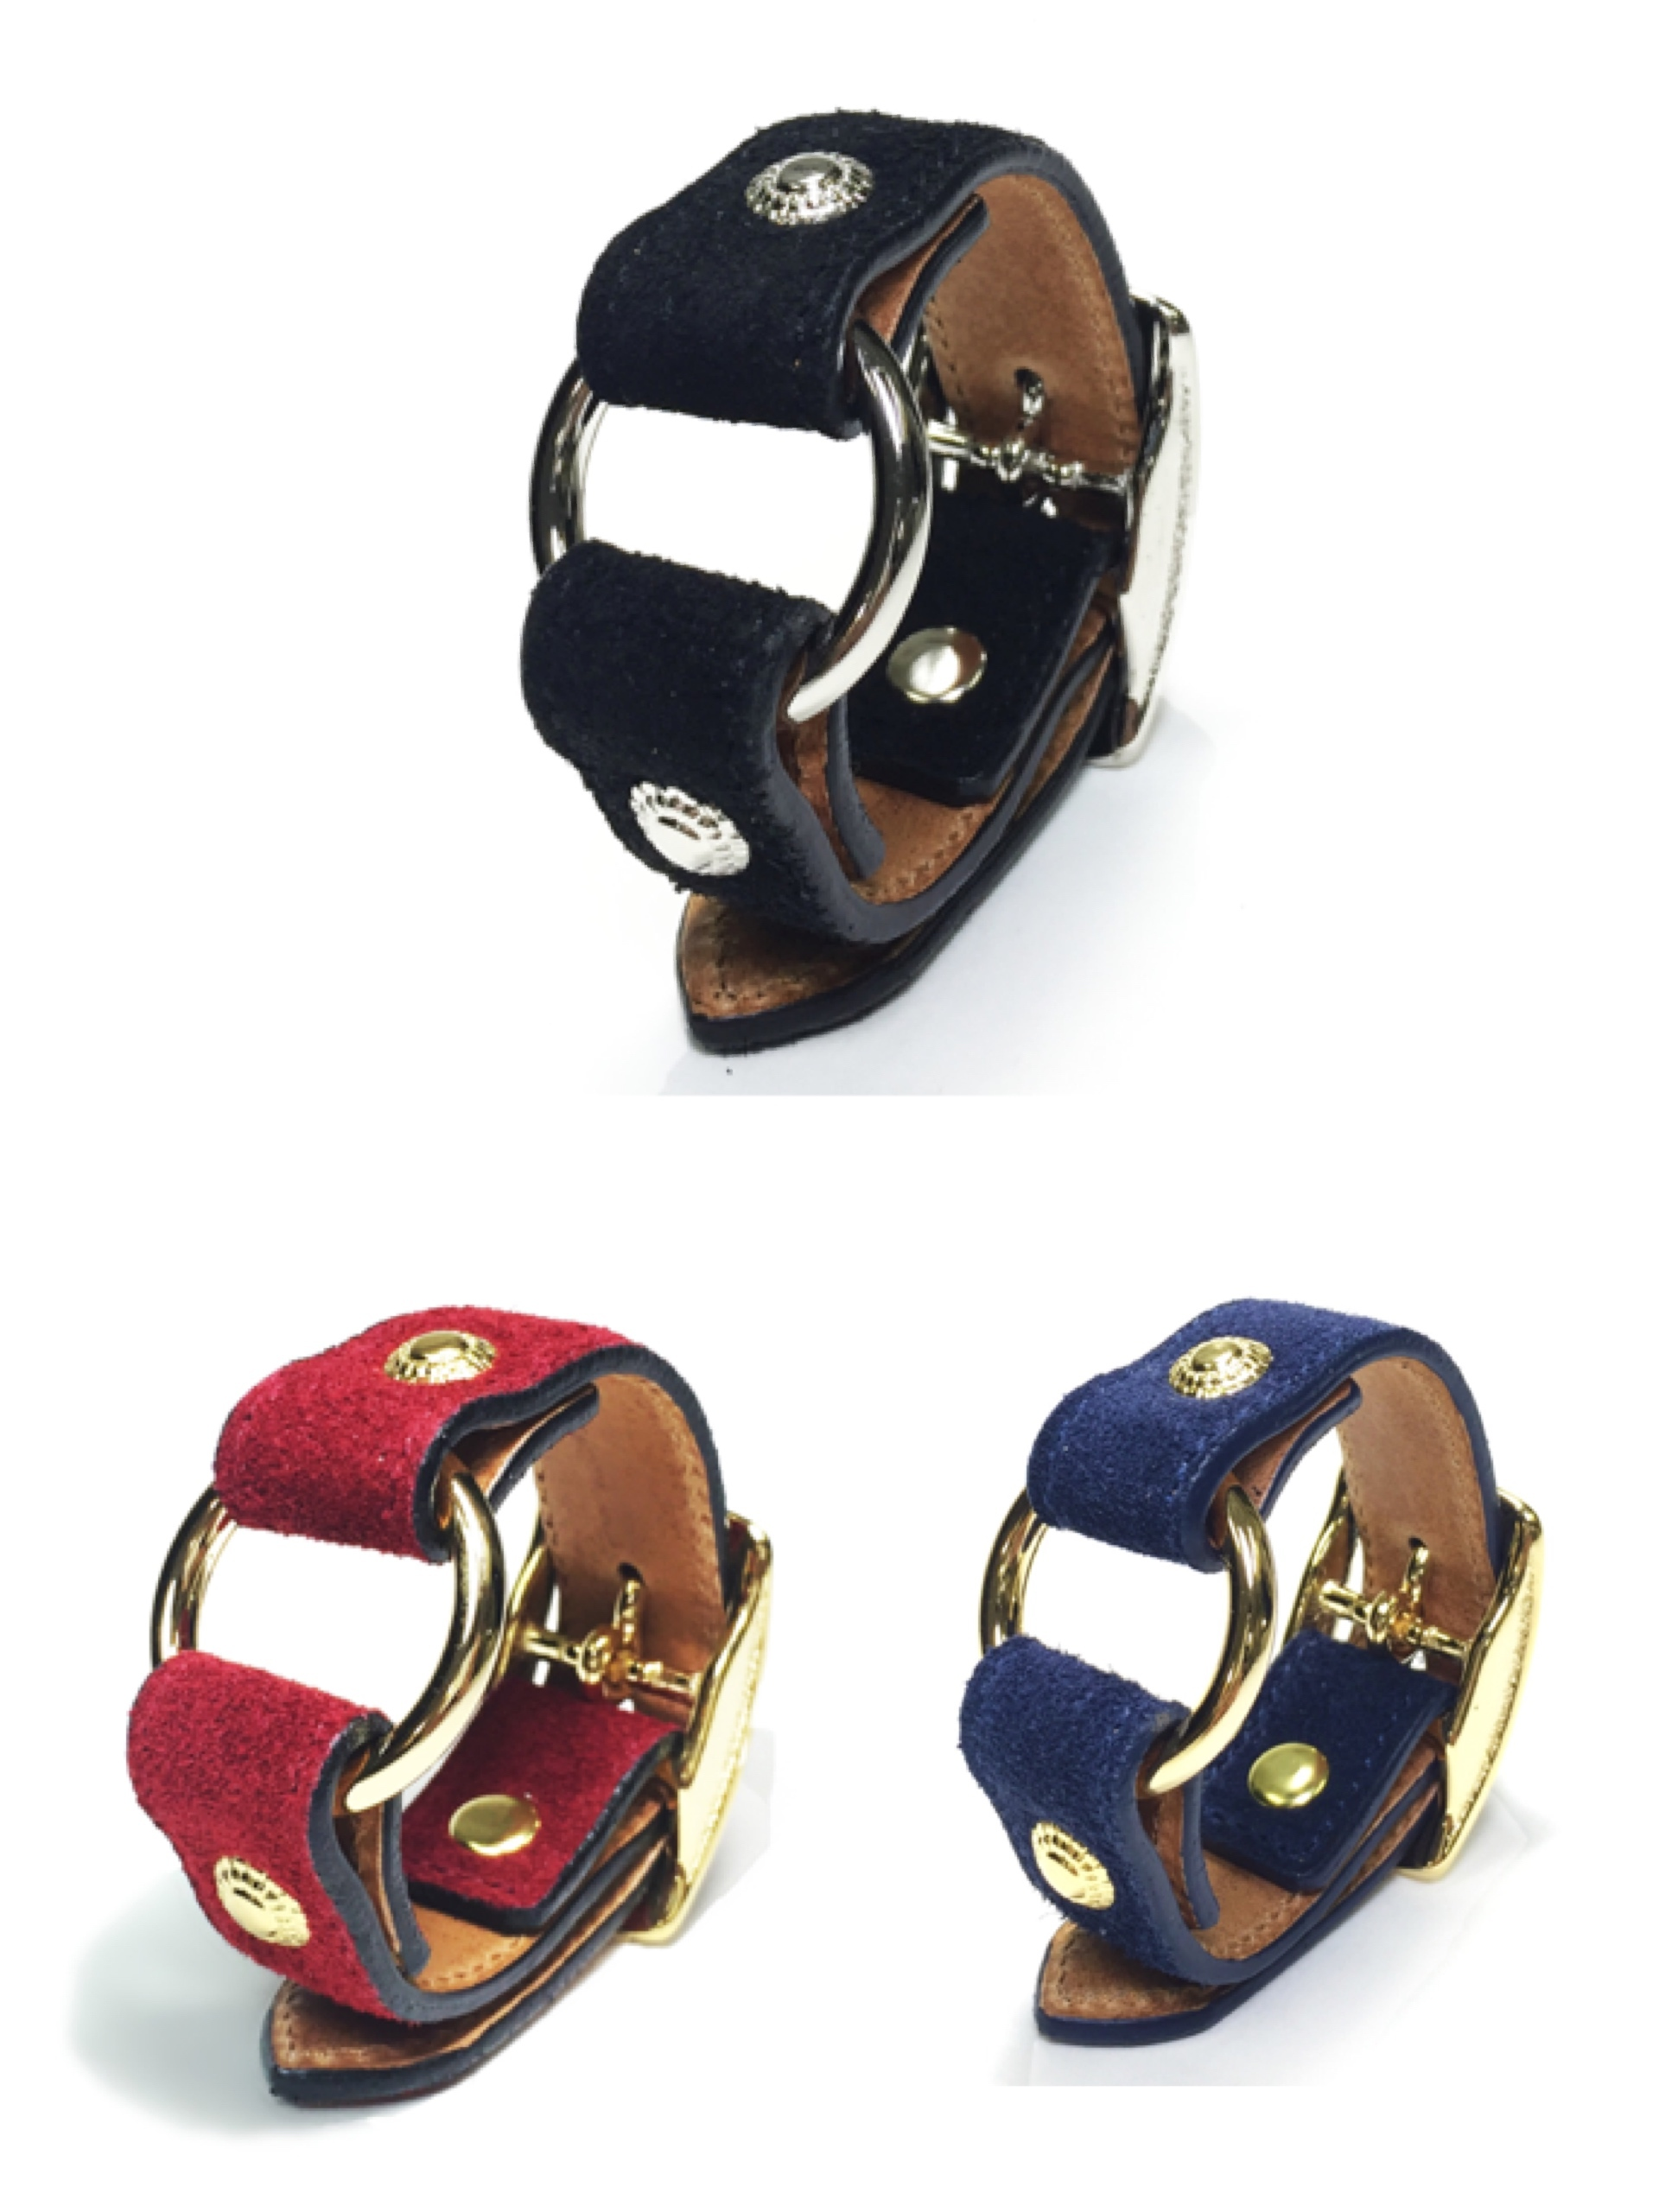 nahezugleich / Suede Ring bracelet - 画像1